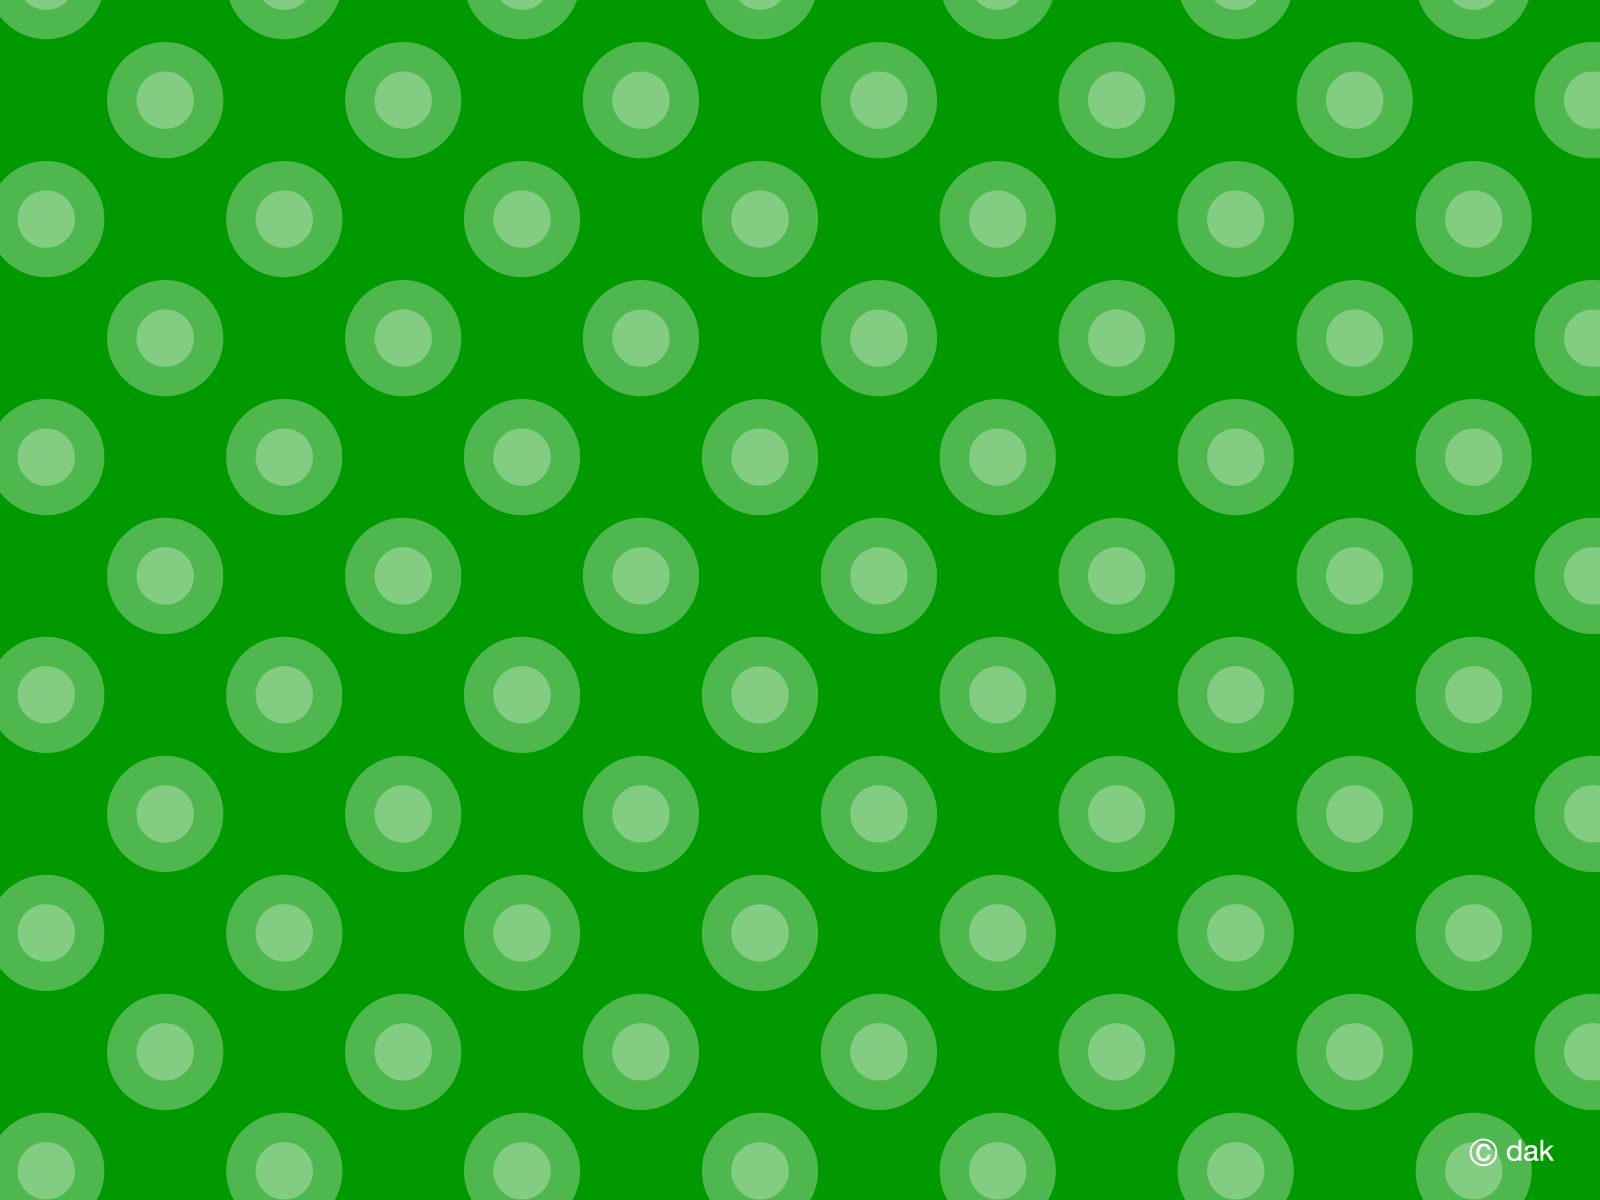 Green polka dots wallpaper free desktop wallpaper backgrounds